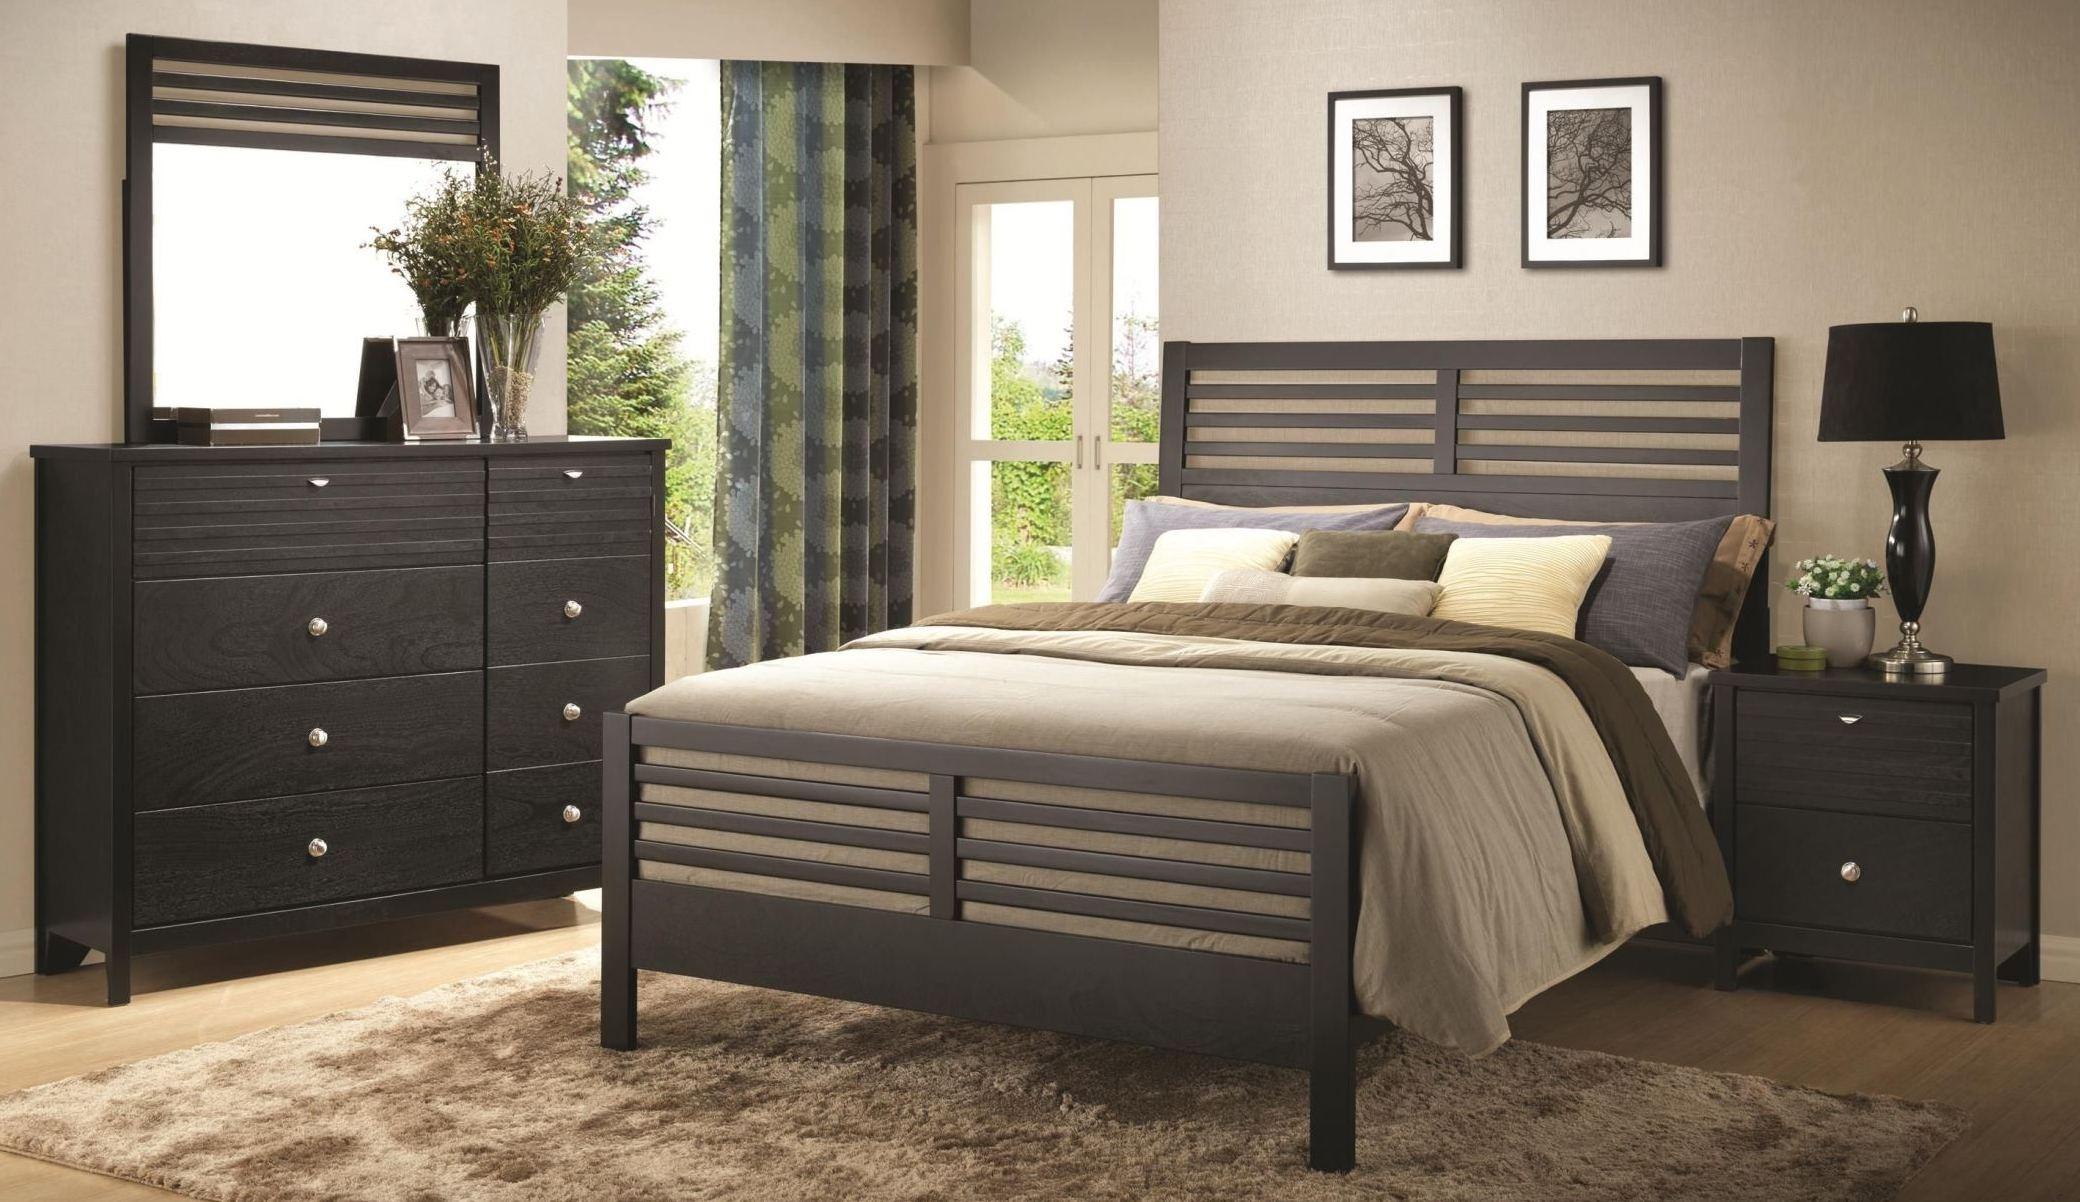 richmond black slat panel bedroom set from coaster 202721qn